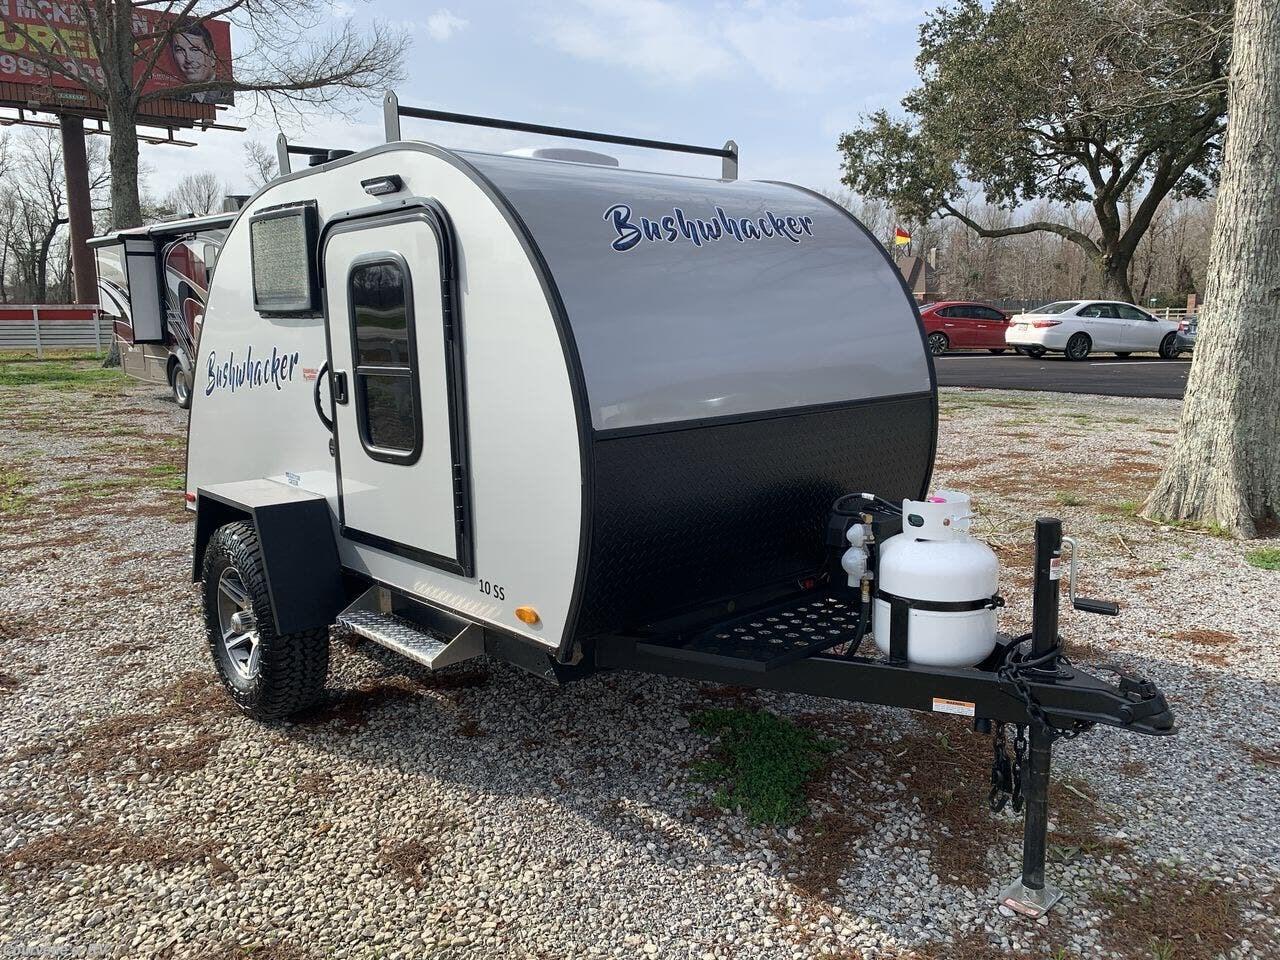 2021 Braxton Creek Bushwhacker 10SS